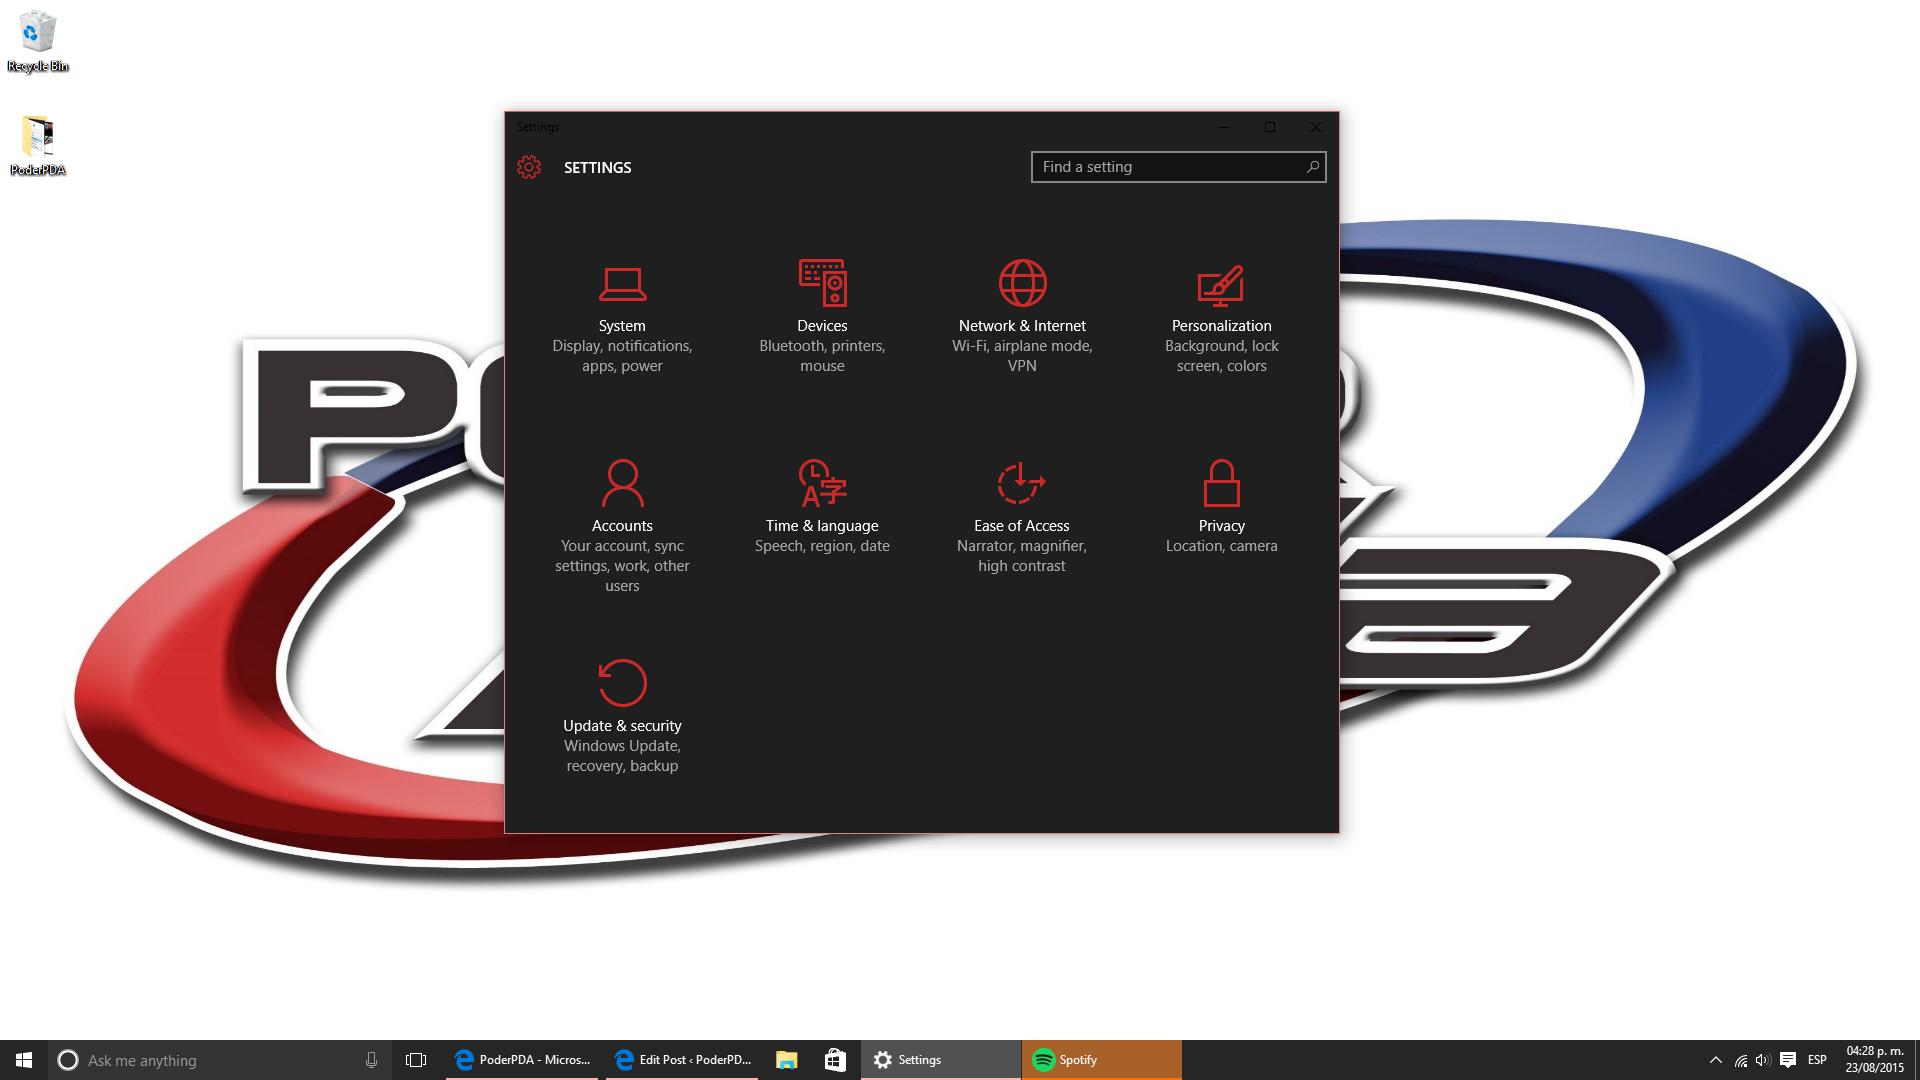 como activar el tema oscuro en windows-tutorial_poderpda